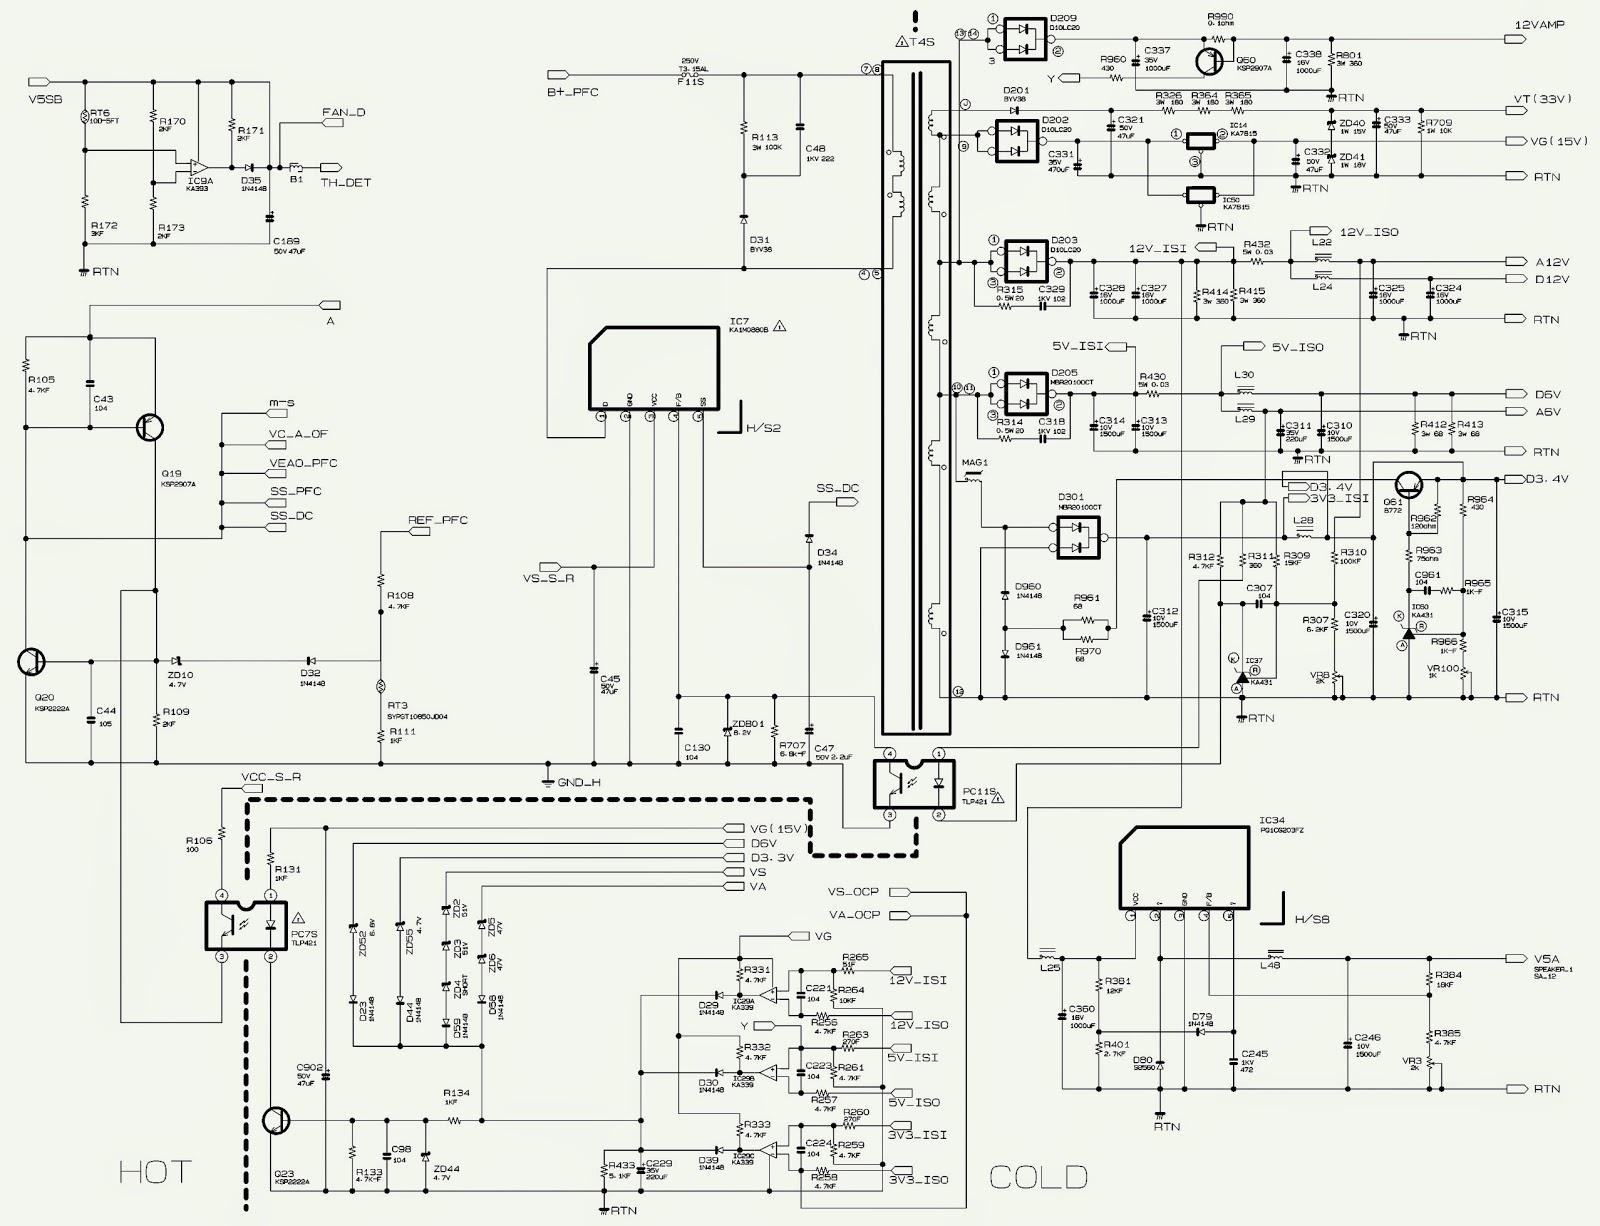 SAMSUNG B4K5 BN96 SMPS SCHEMATIC | Electro help